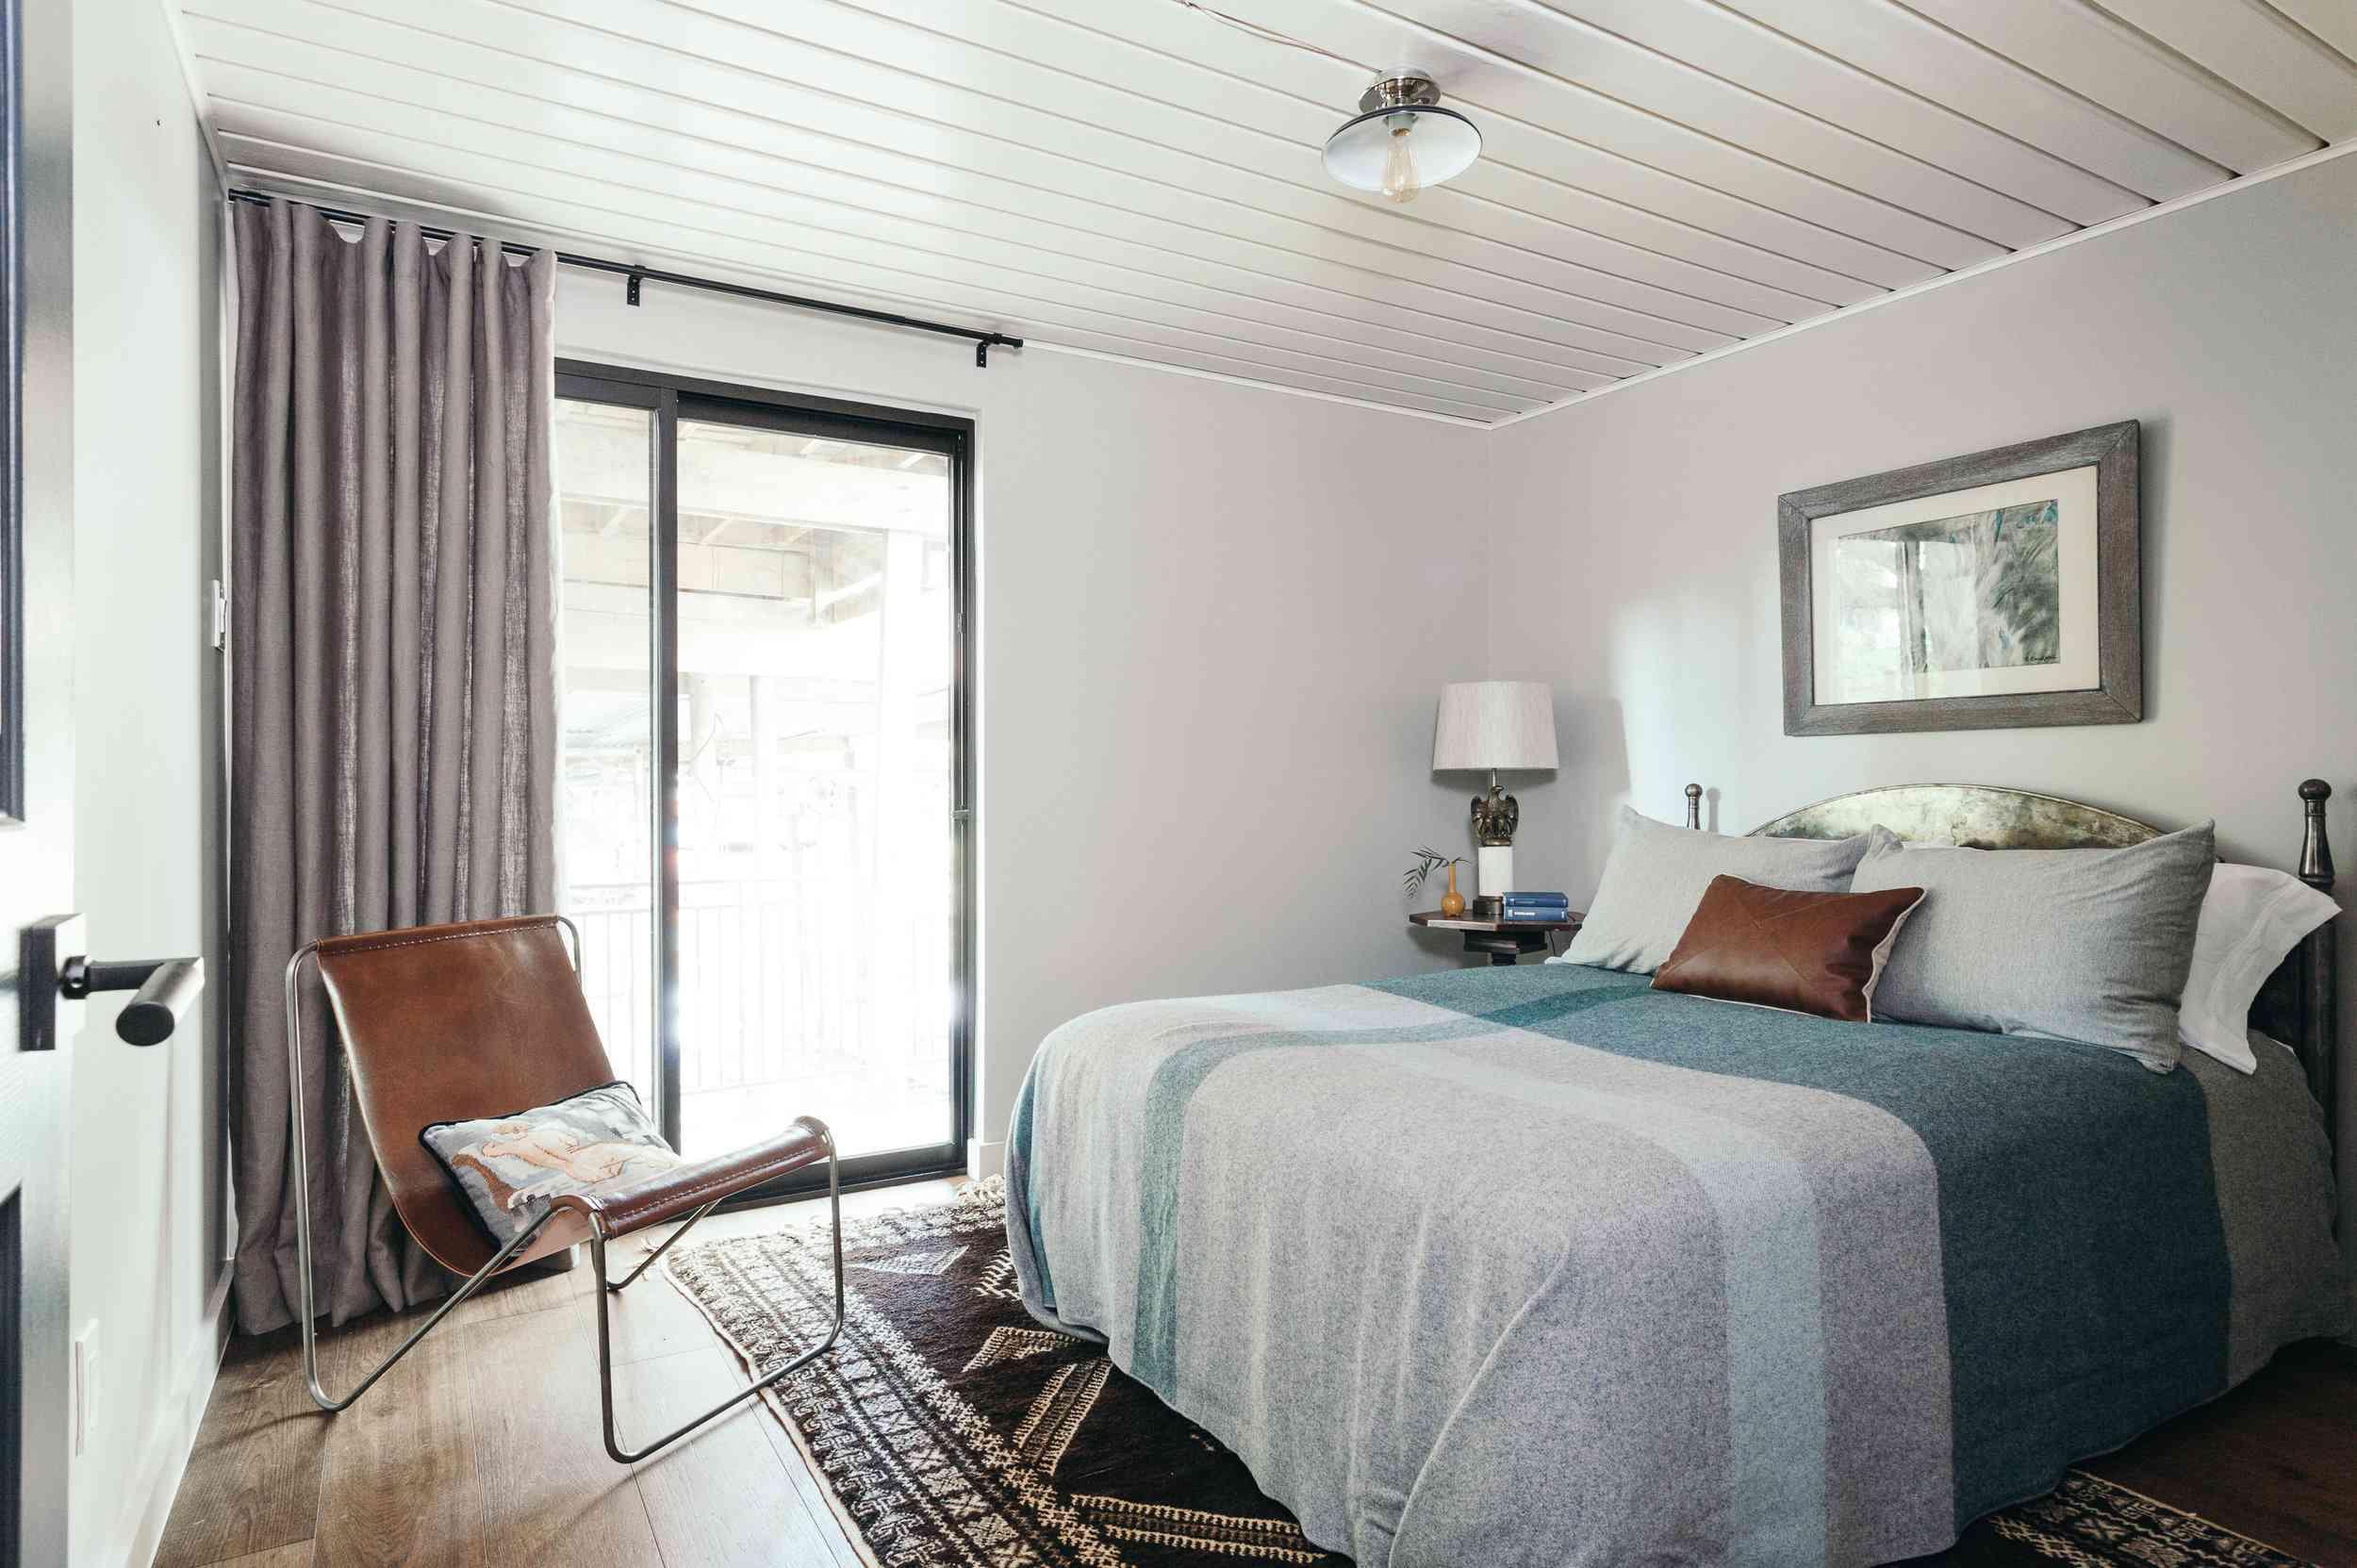 Lavender bedroom curtains